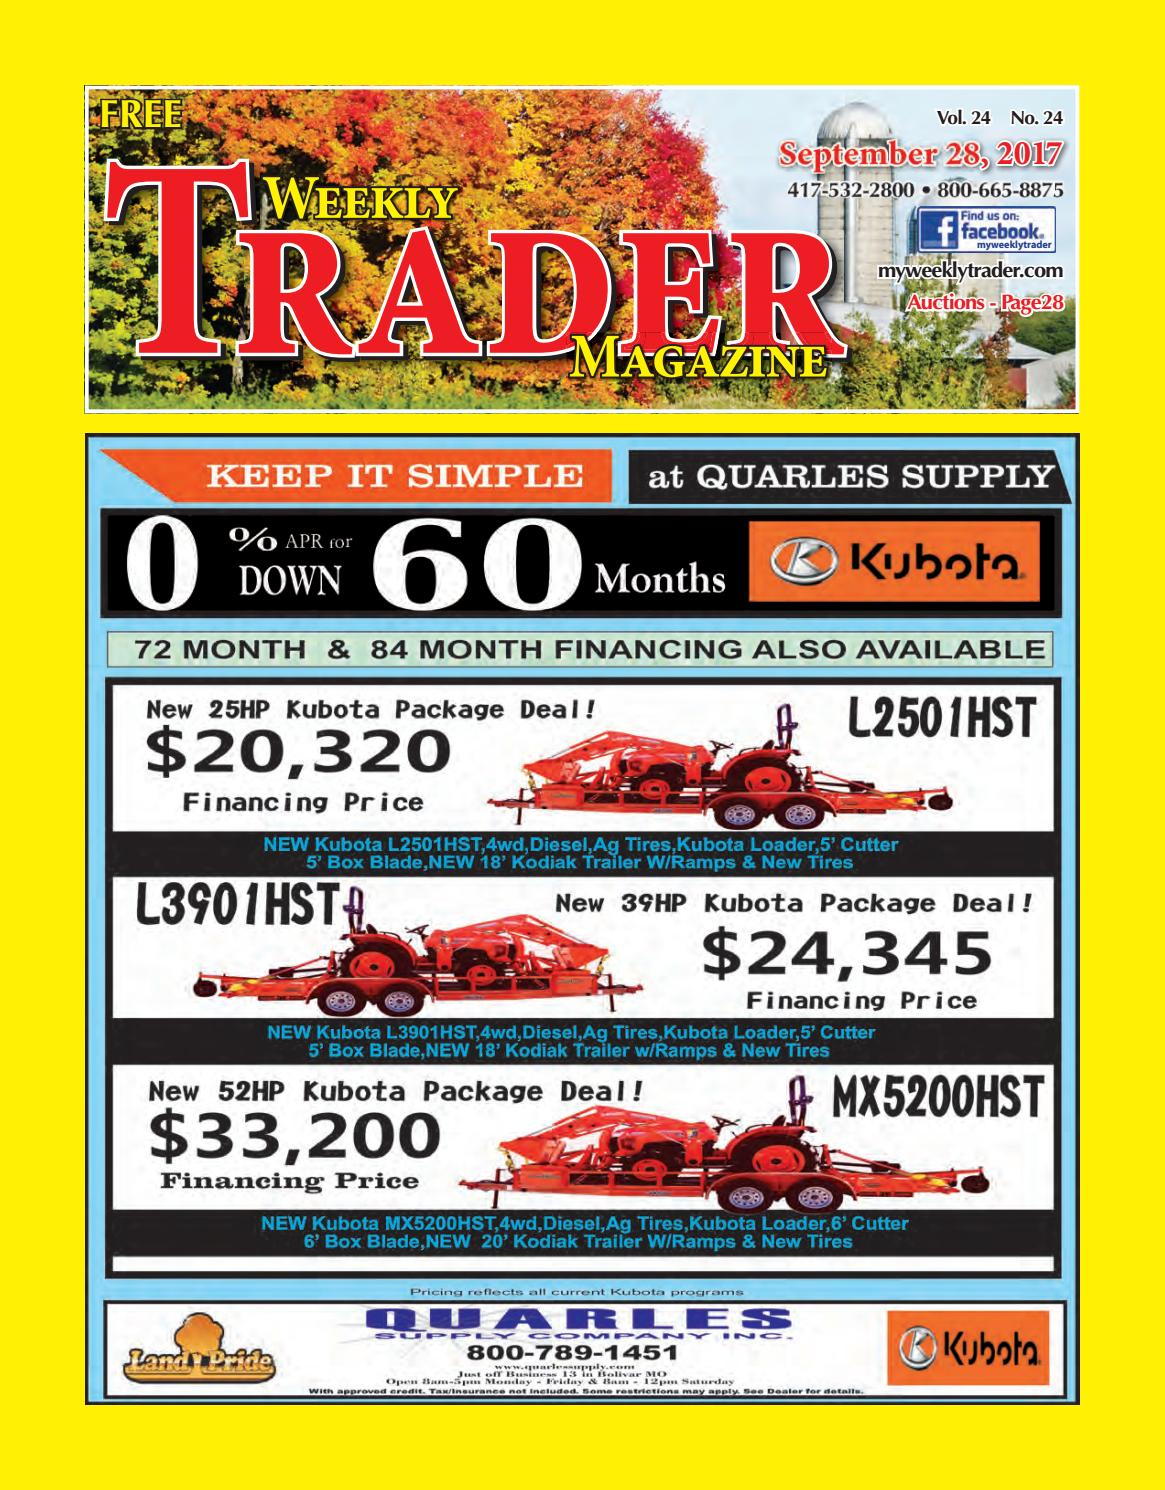 Weekly Trader September 28, 2017 by Weekly Trader - issuu